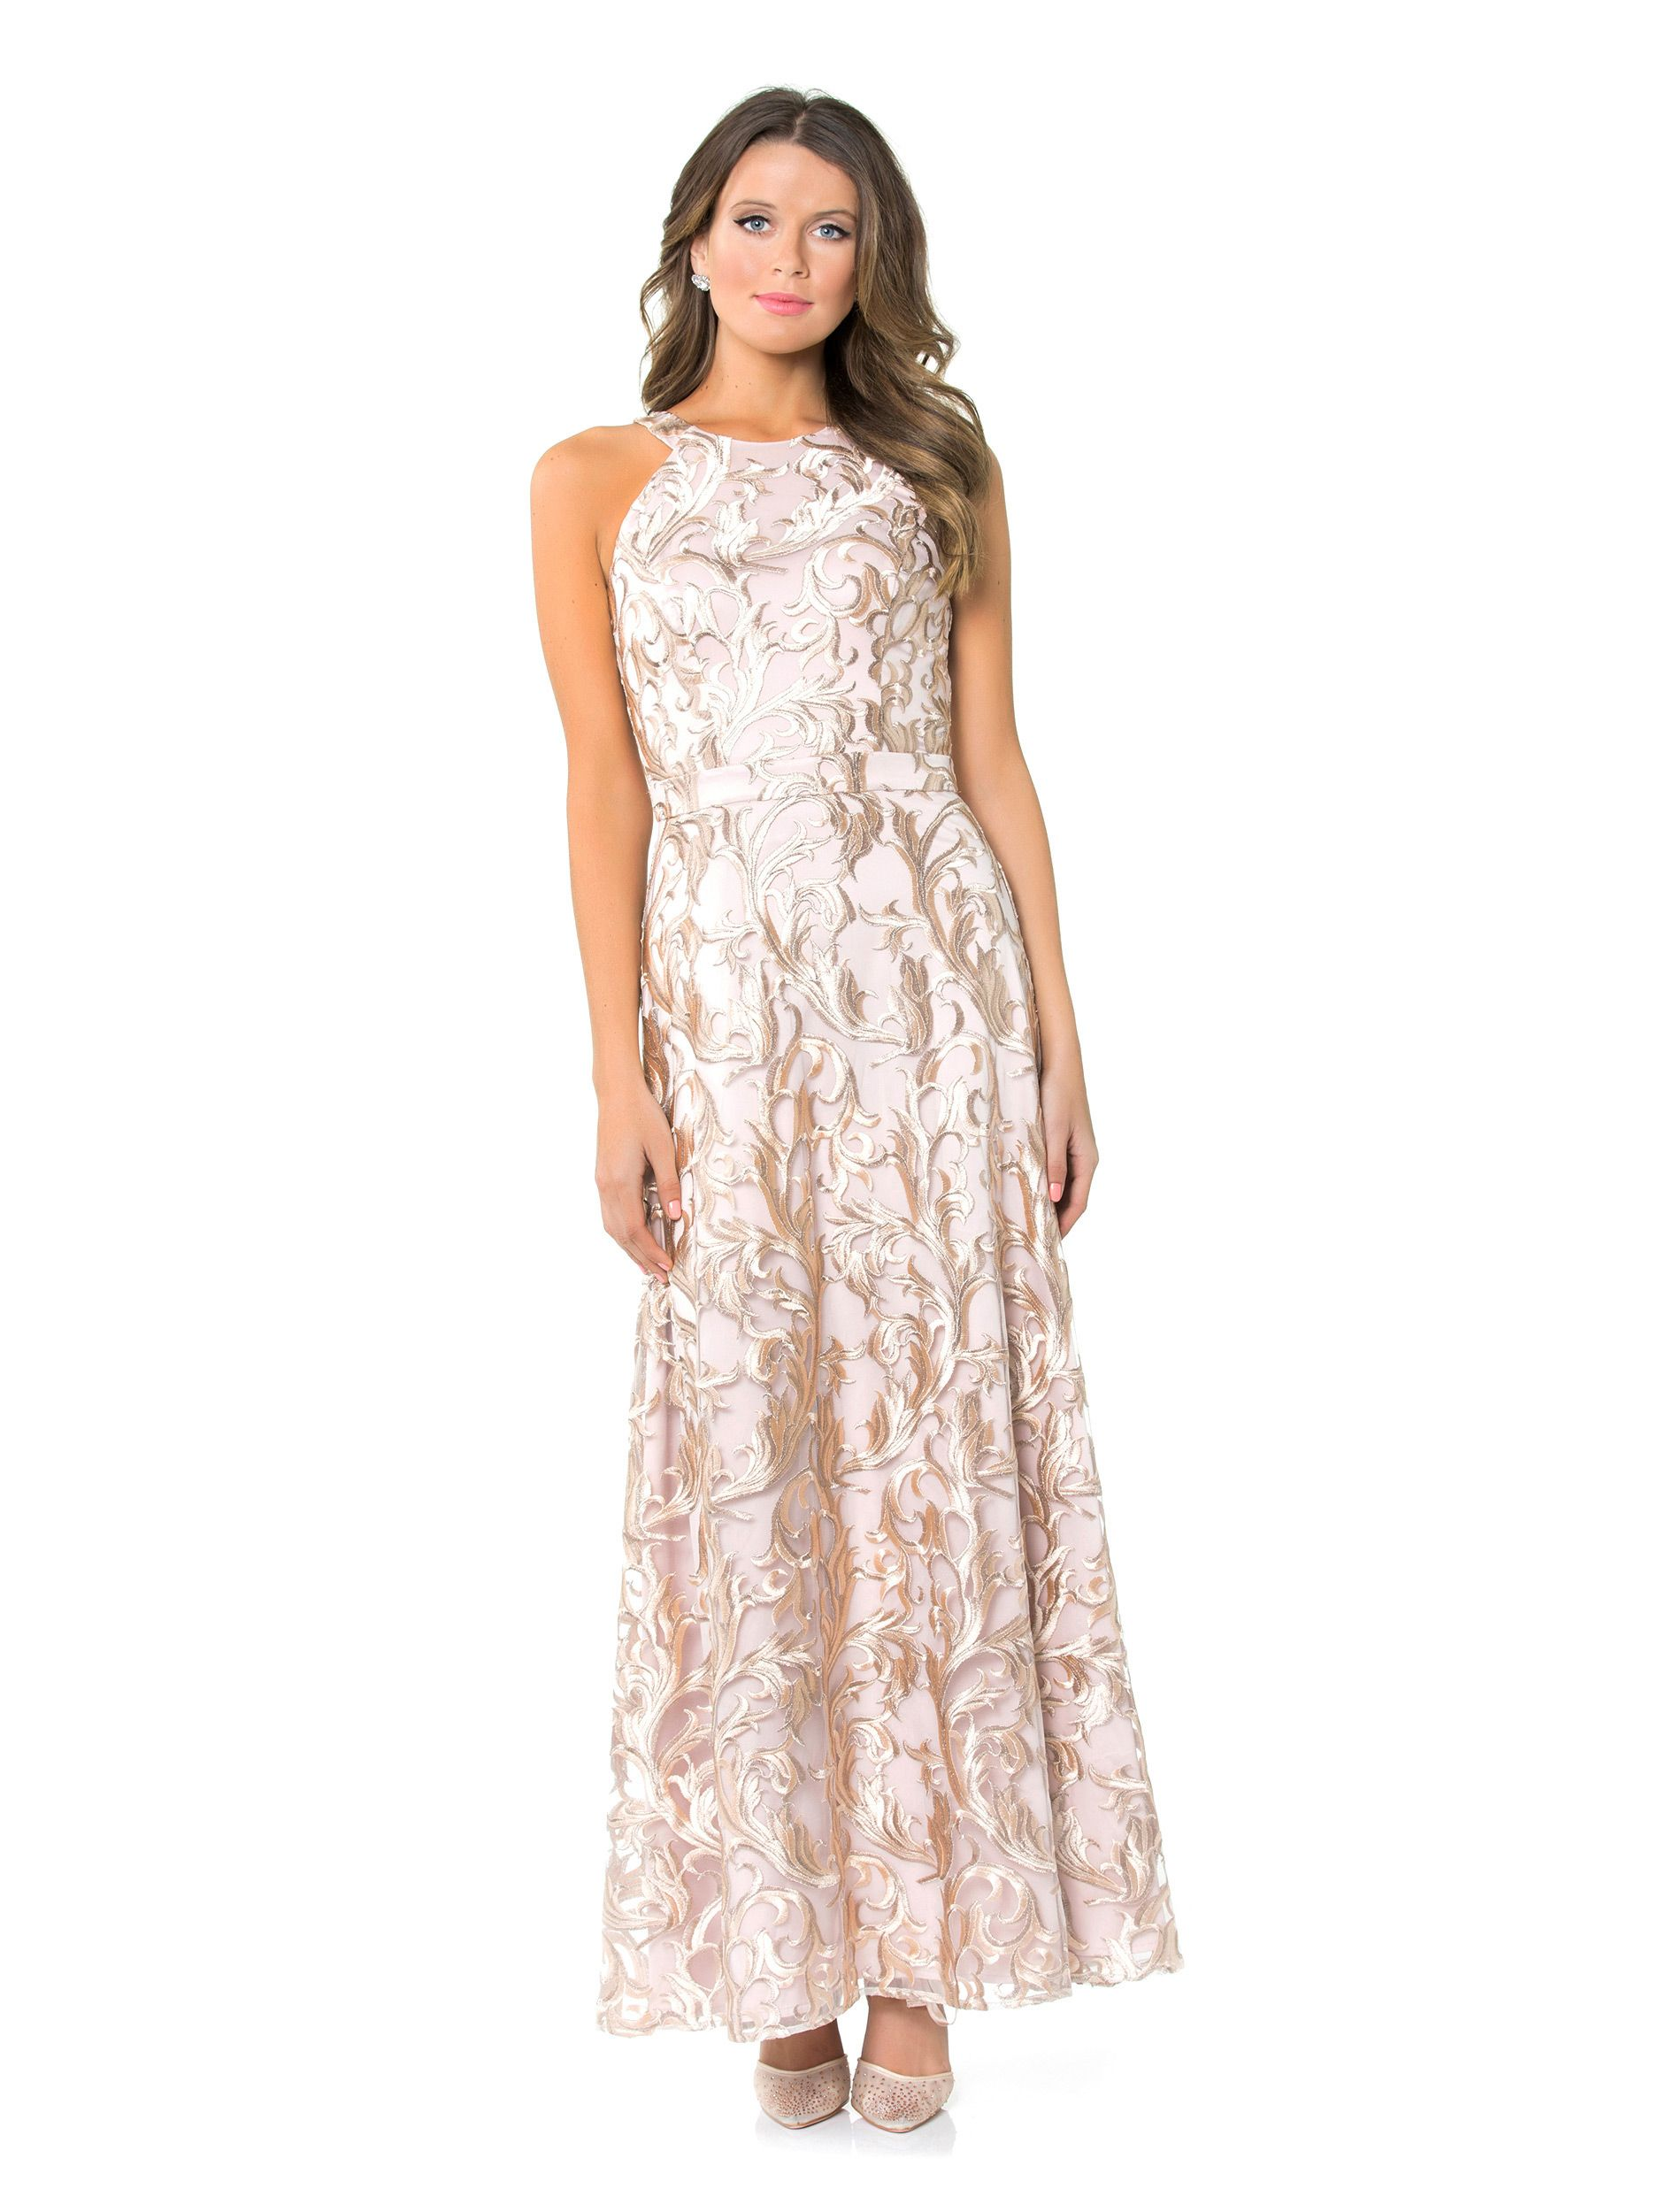 Until forever maxi dress review australia pretty dresses